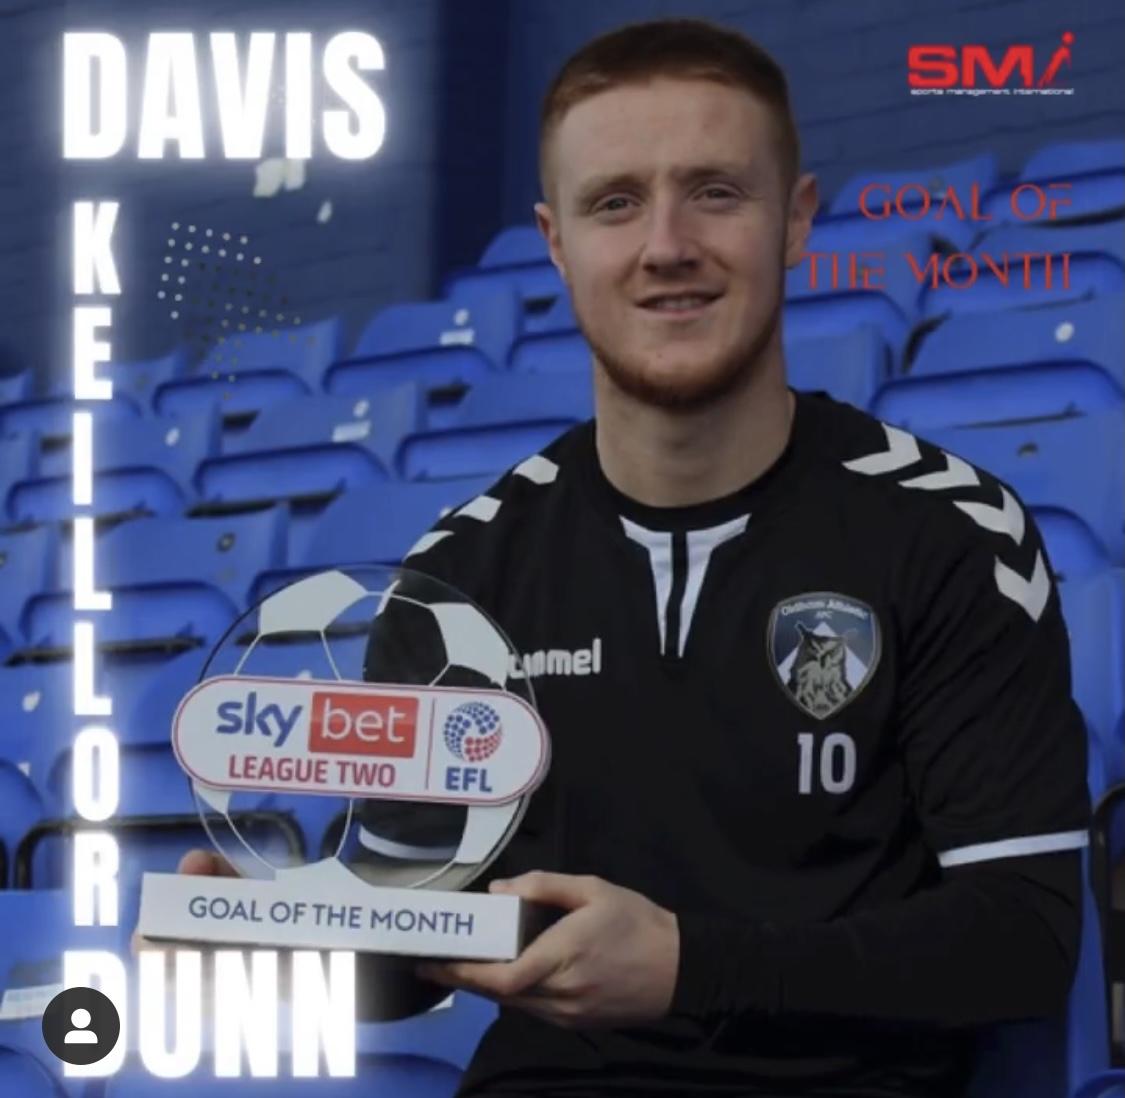 Davis Keillor Dunner awards